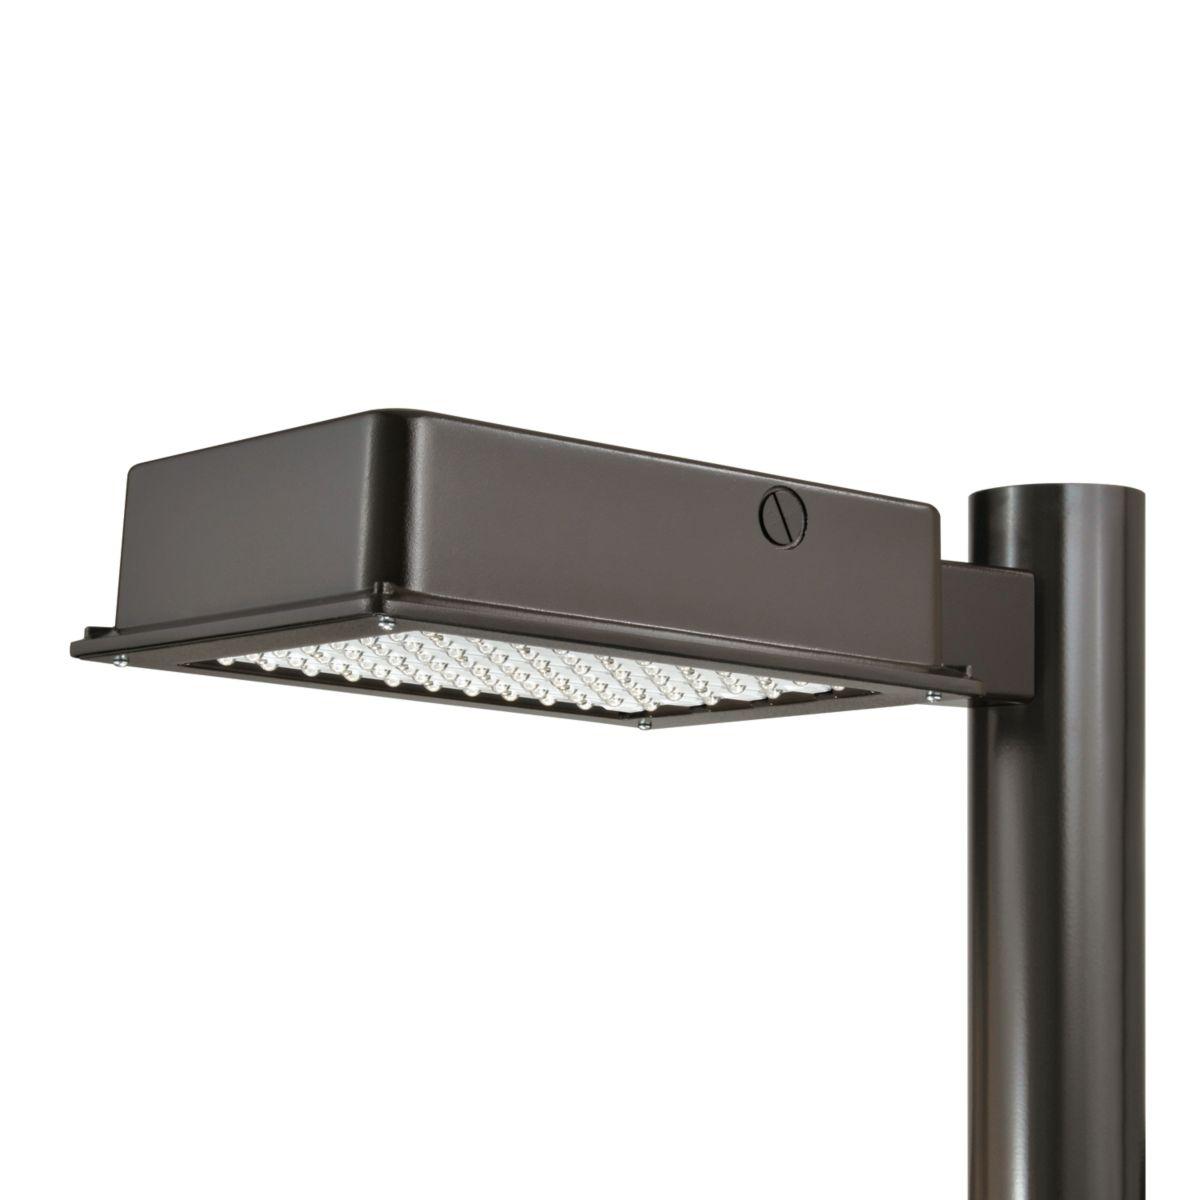 RDG Ridgeview LED